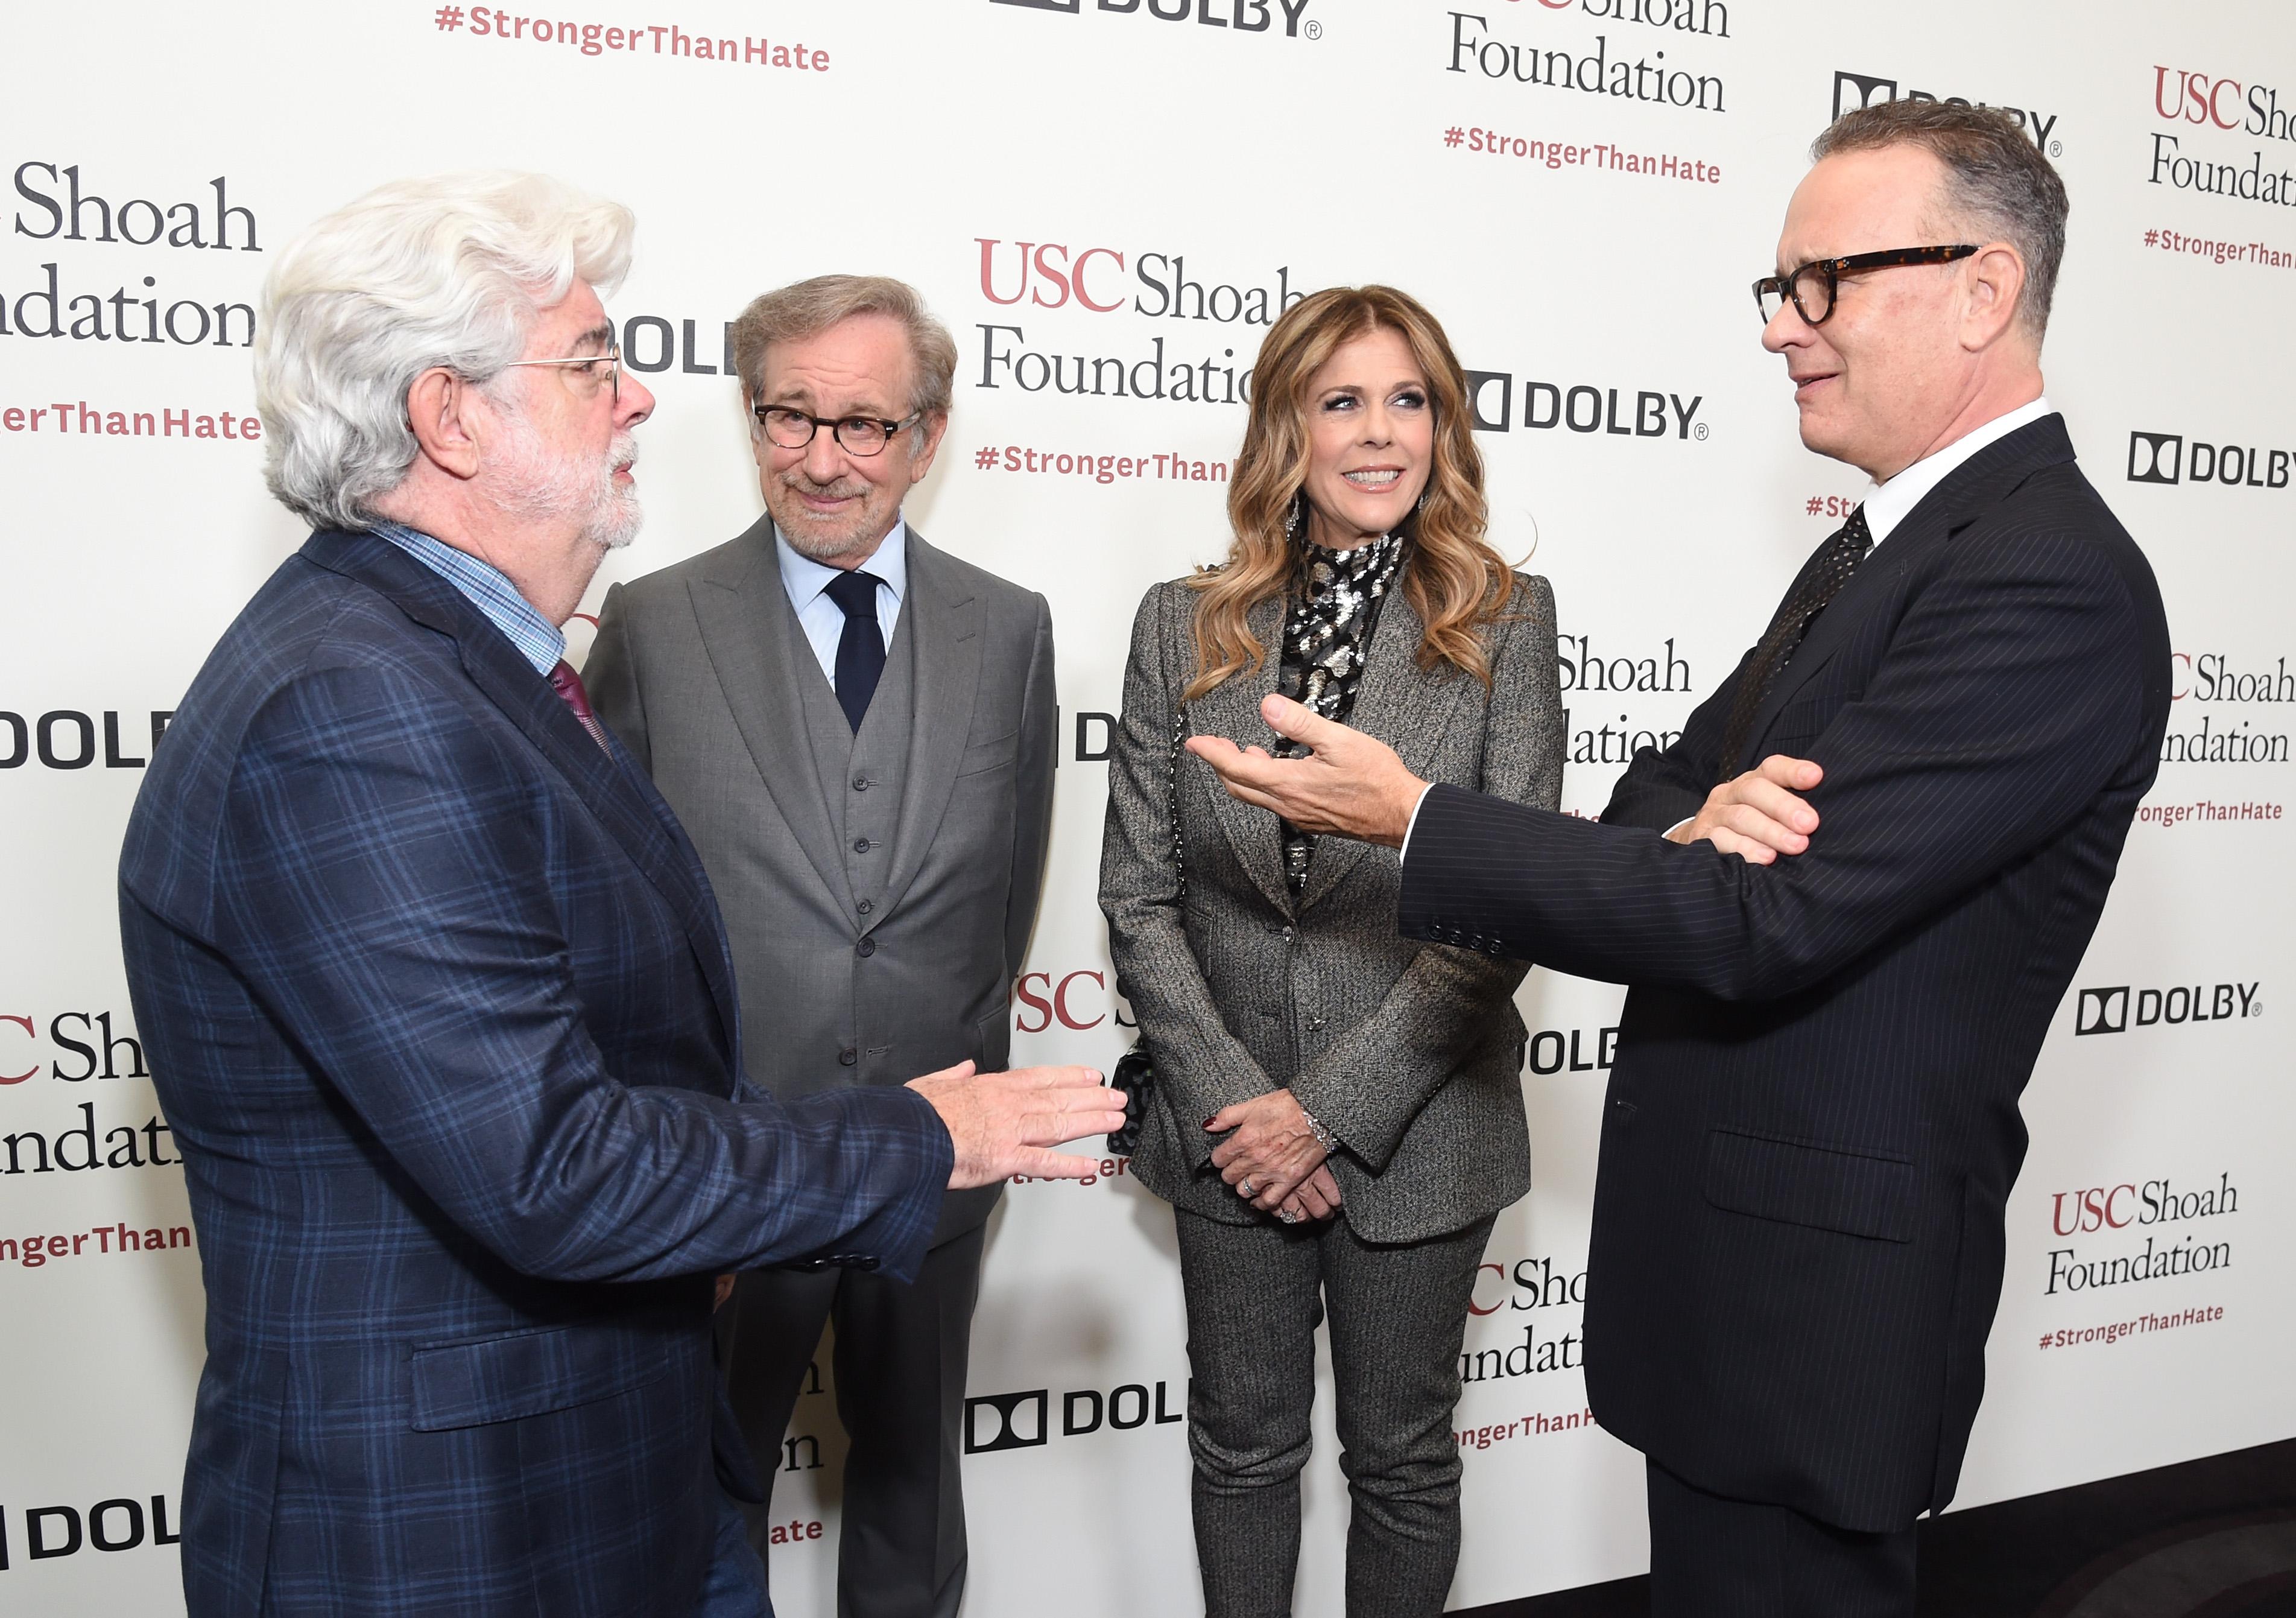 Steven Spielberg and USC Shoah Foundation Honor Rita ...